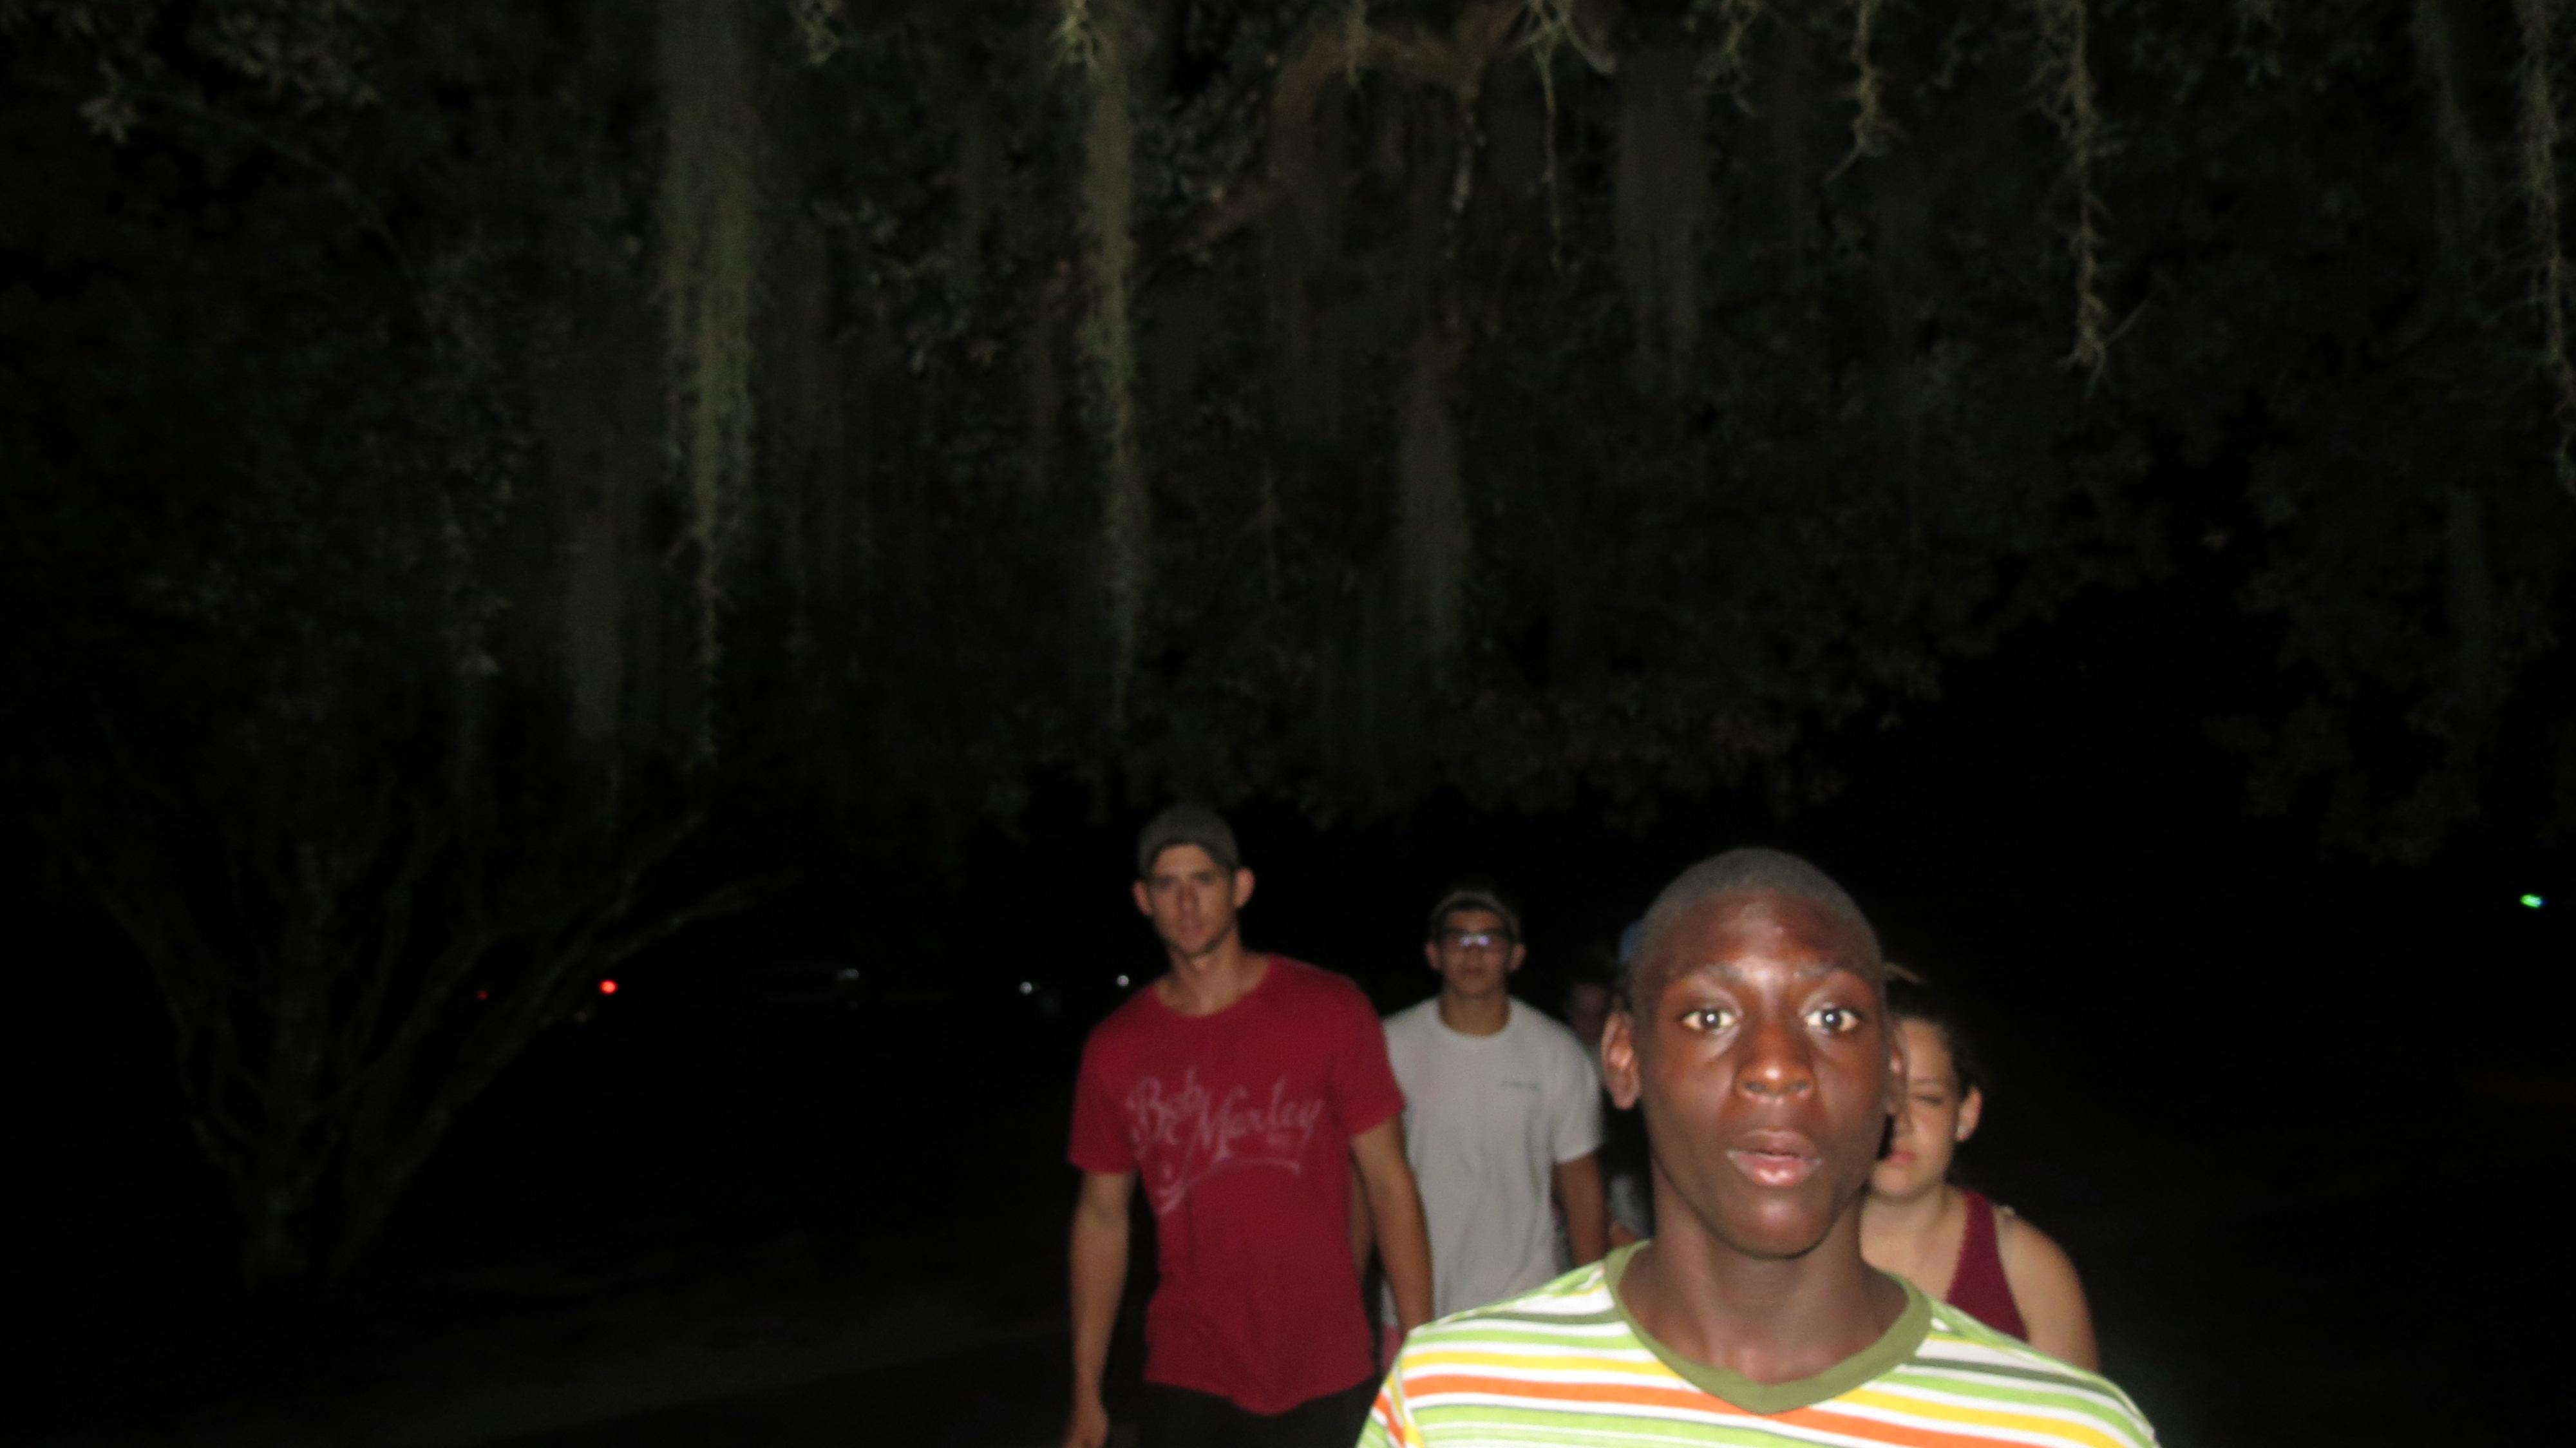 2015 DWELL Cross Street Youth Camp 173